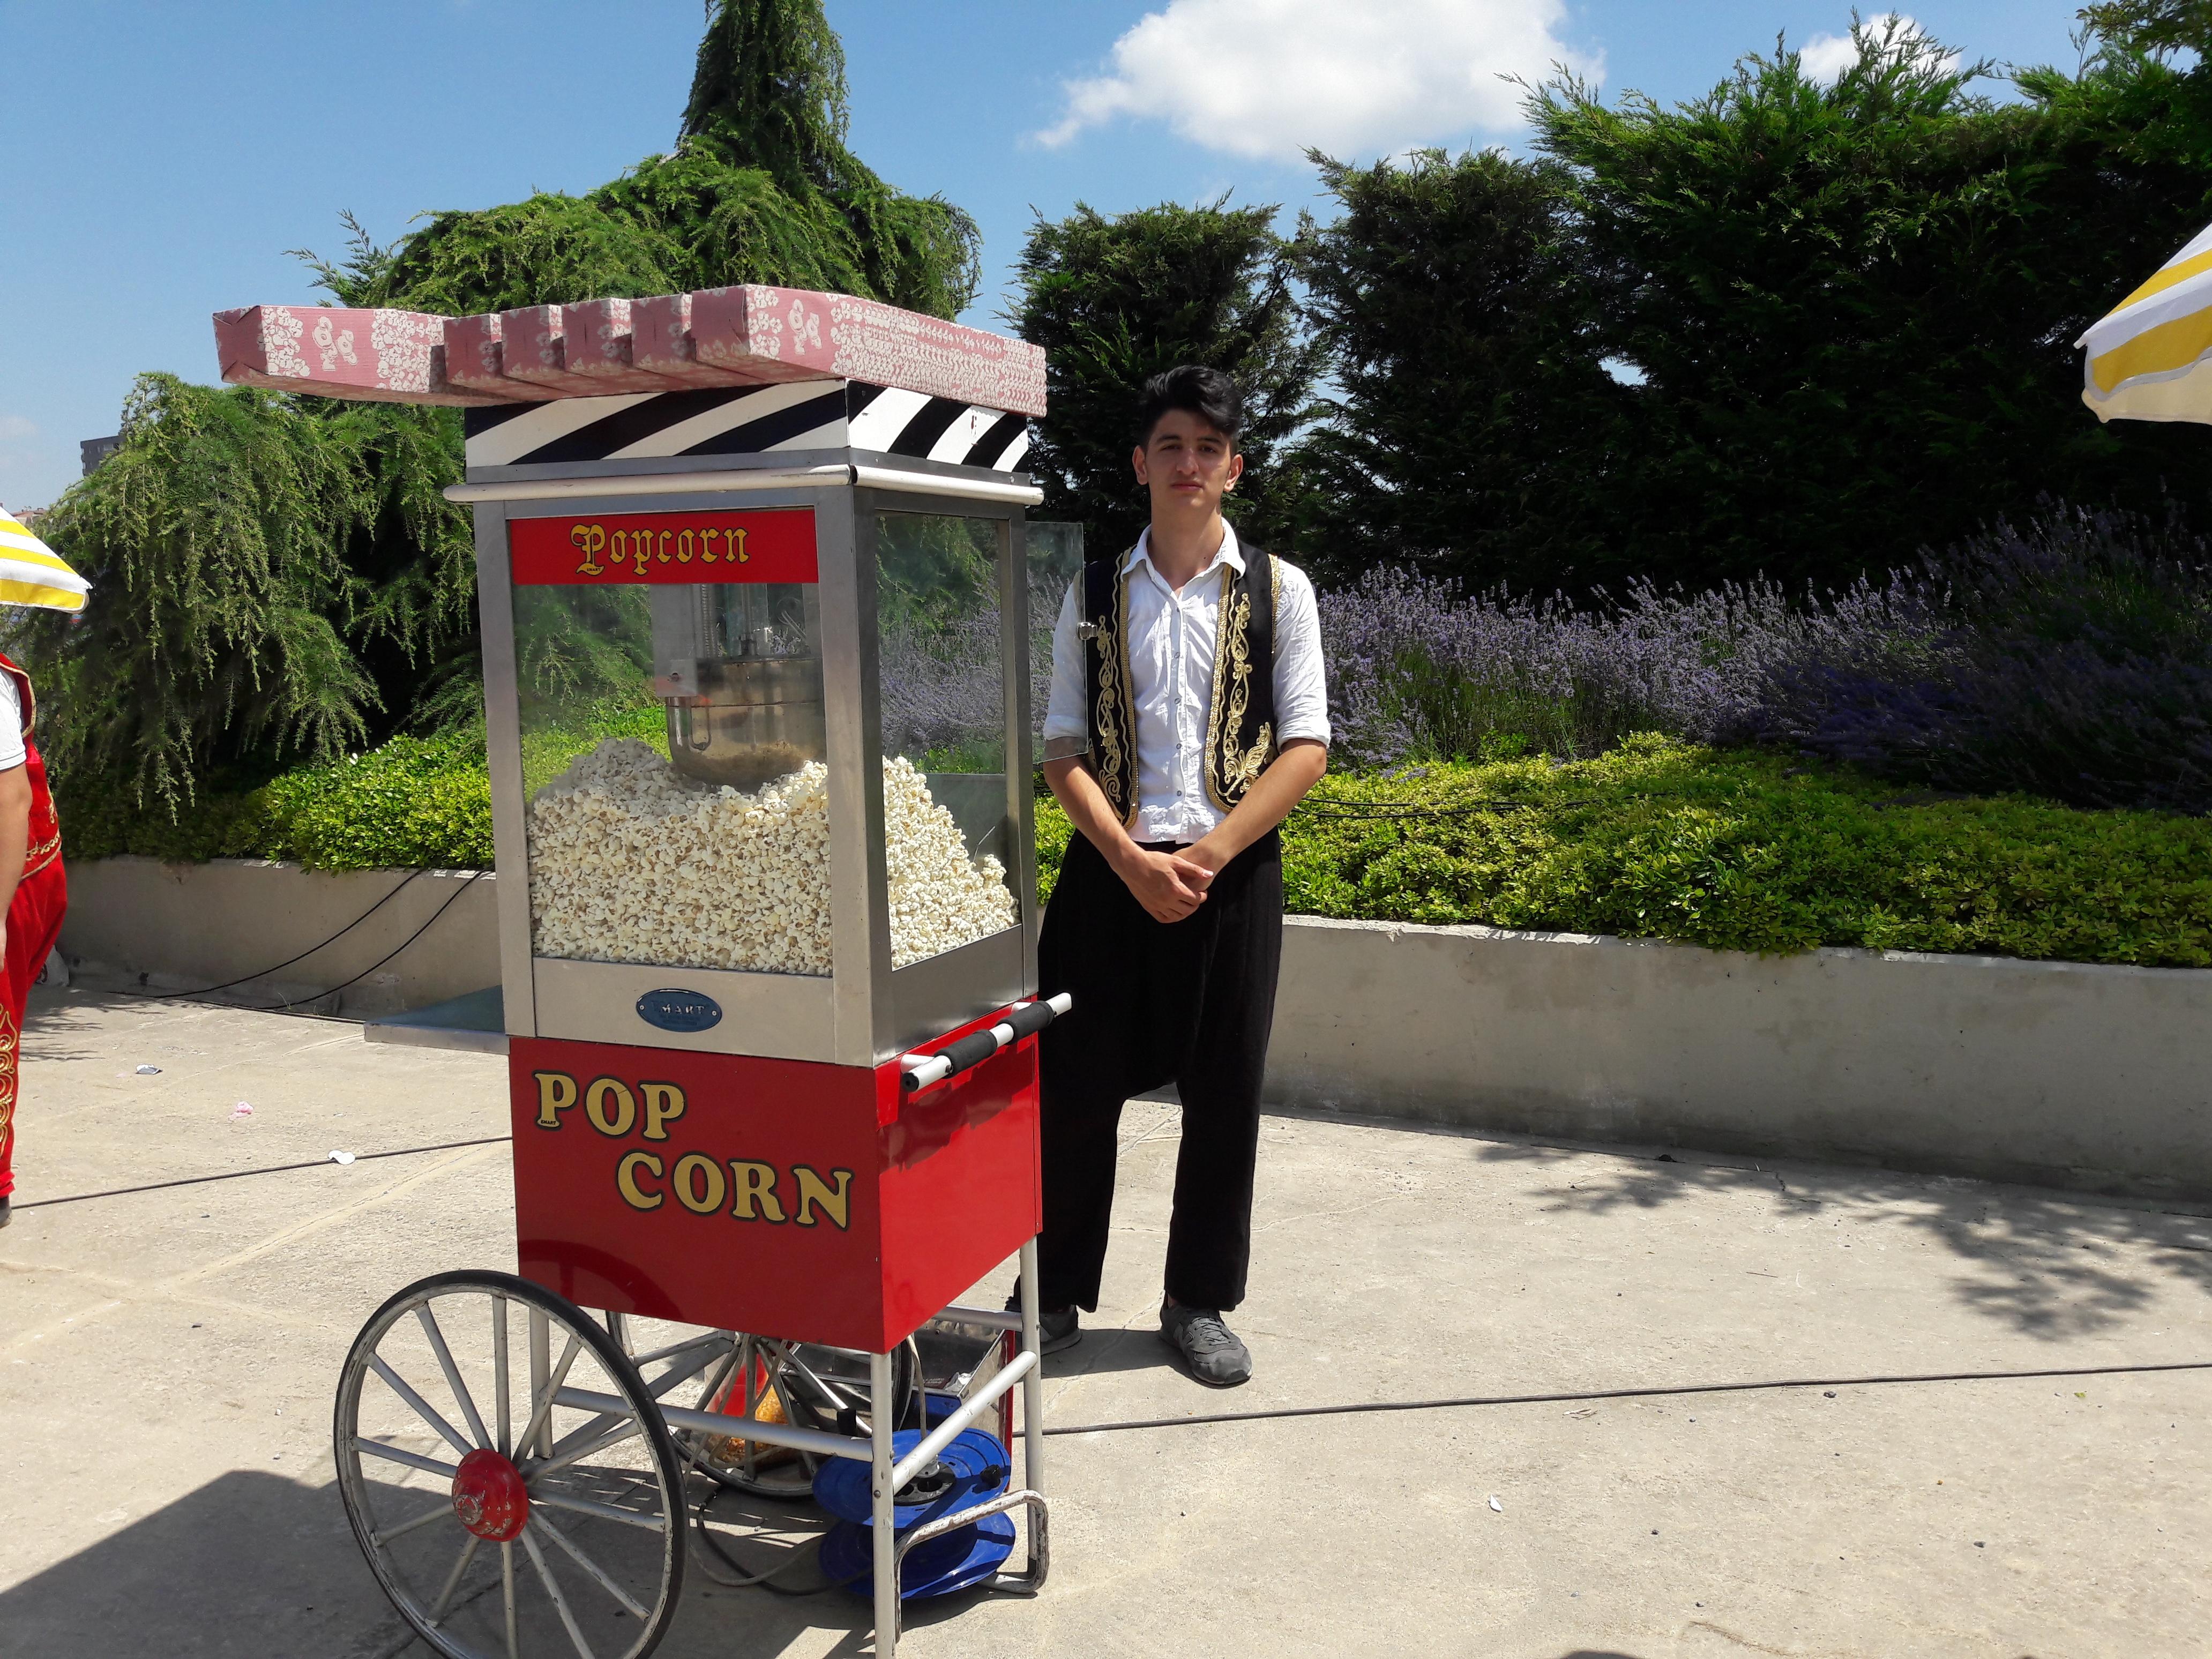 Popcorn Kiralama